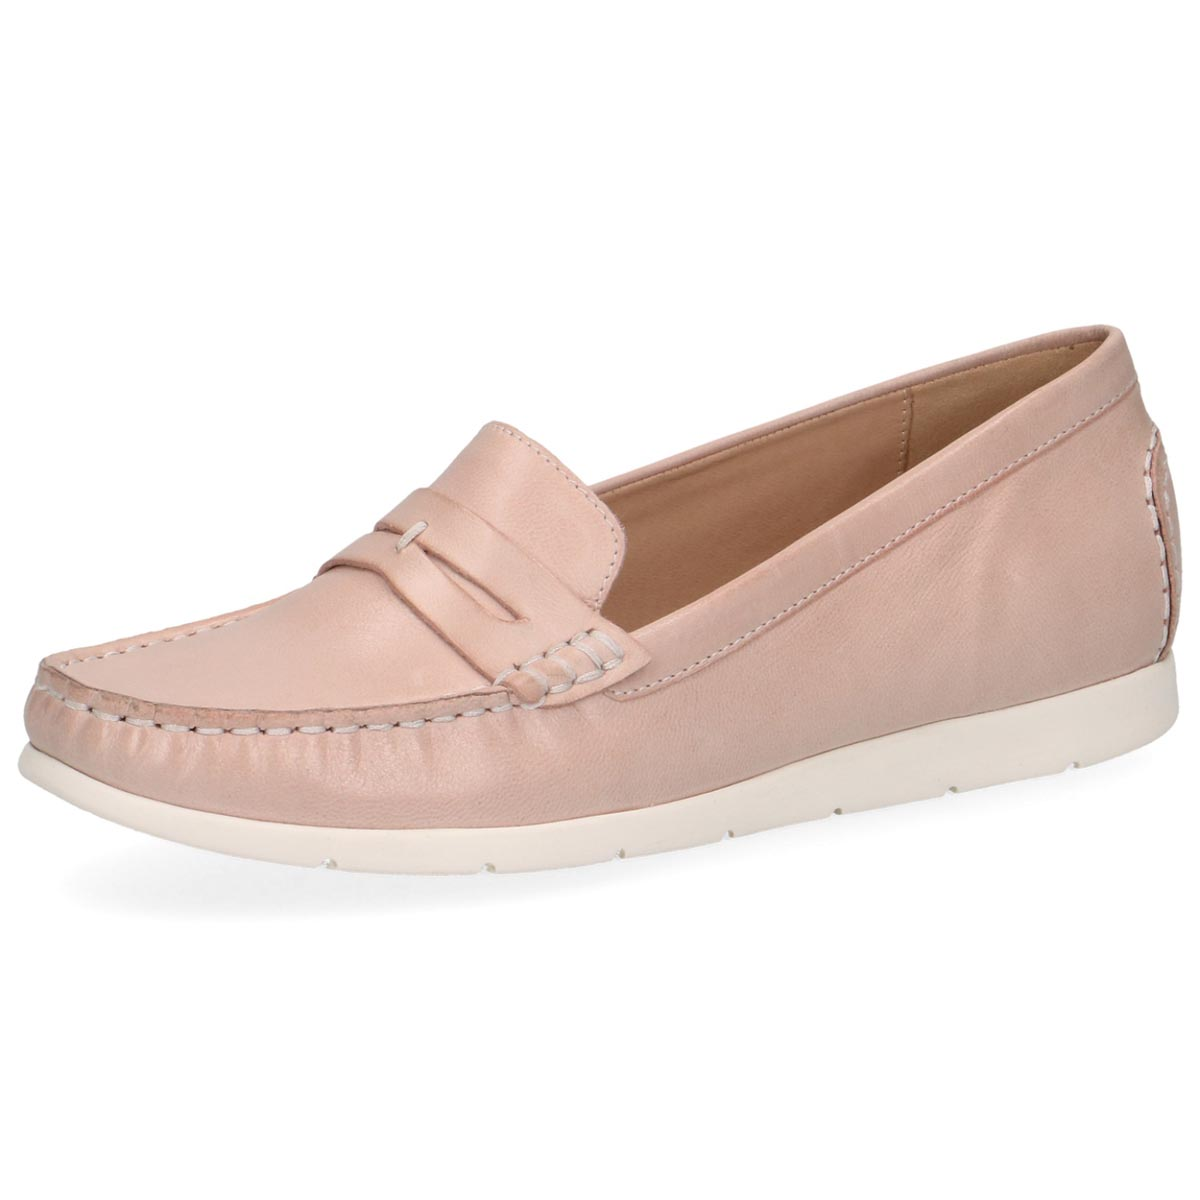 Leila - Caprice Soft Pink Loafer